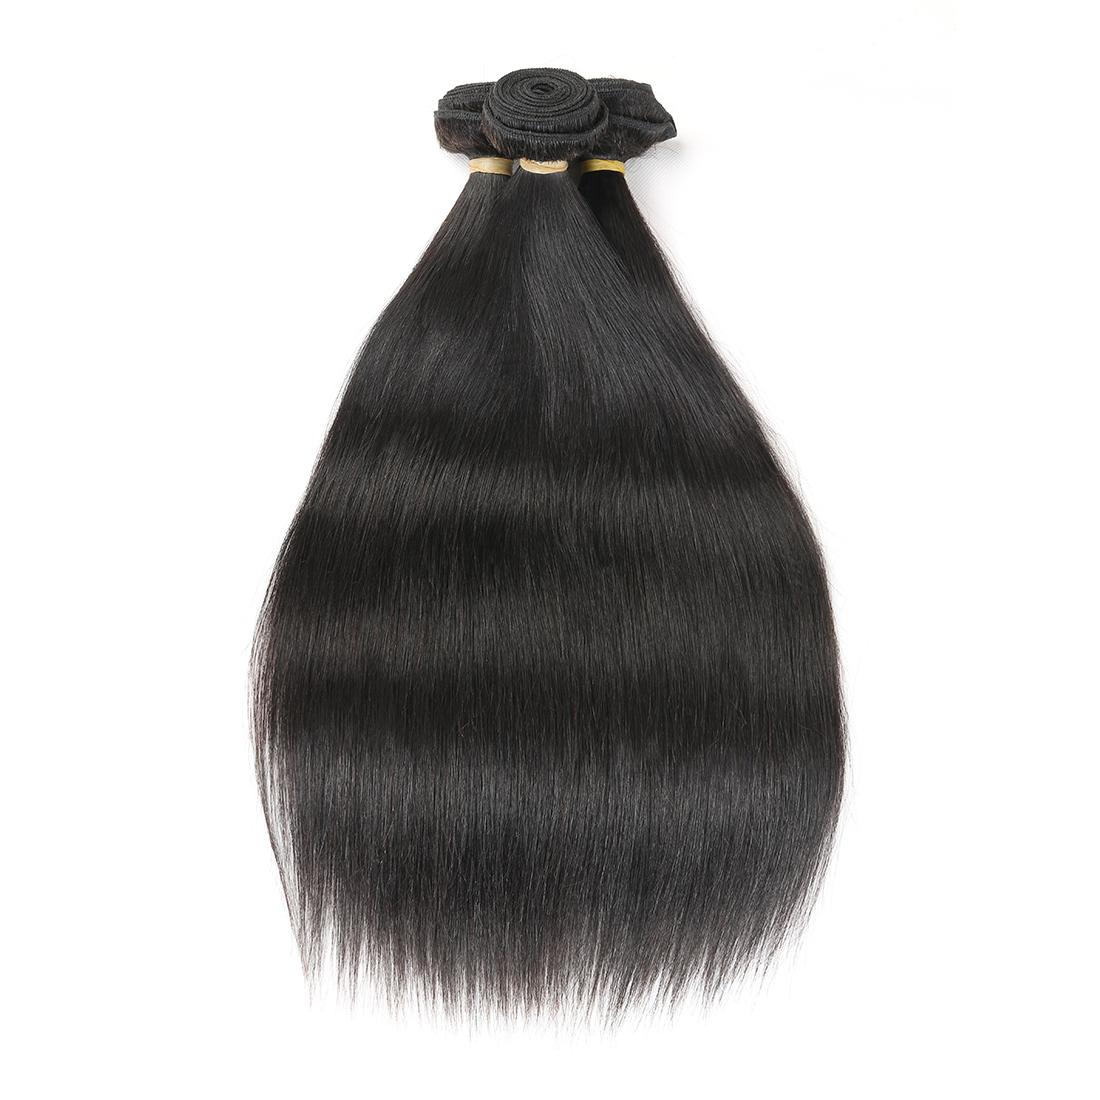 8A Indian Straight 3 Bundles Human Virgin Hair Weave